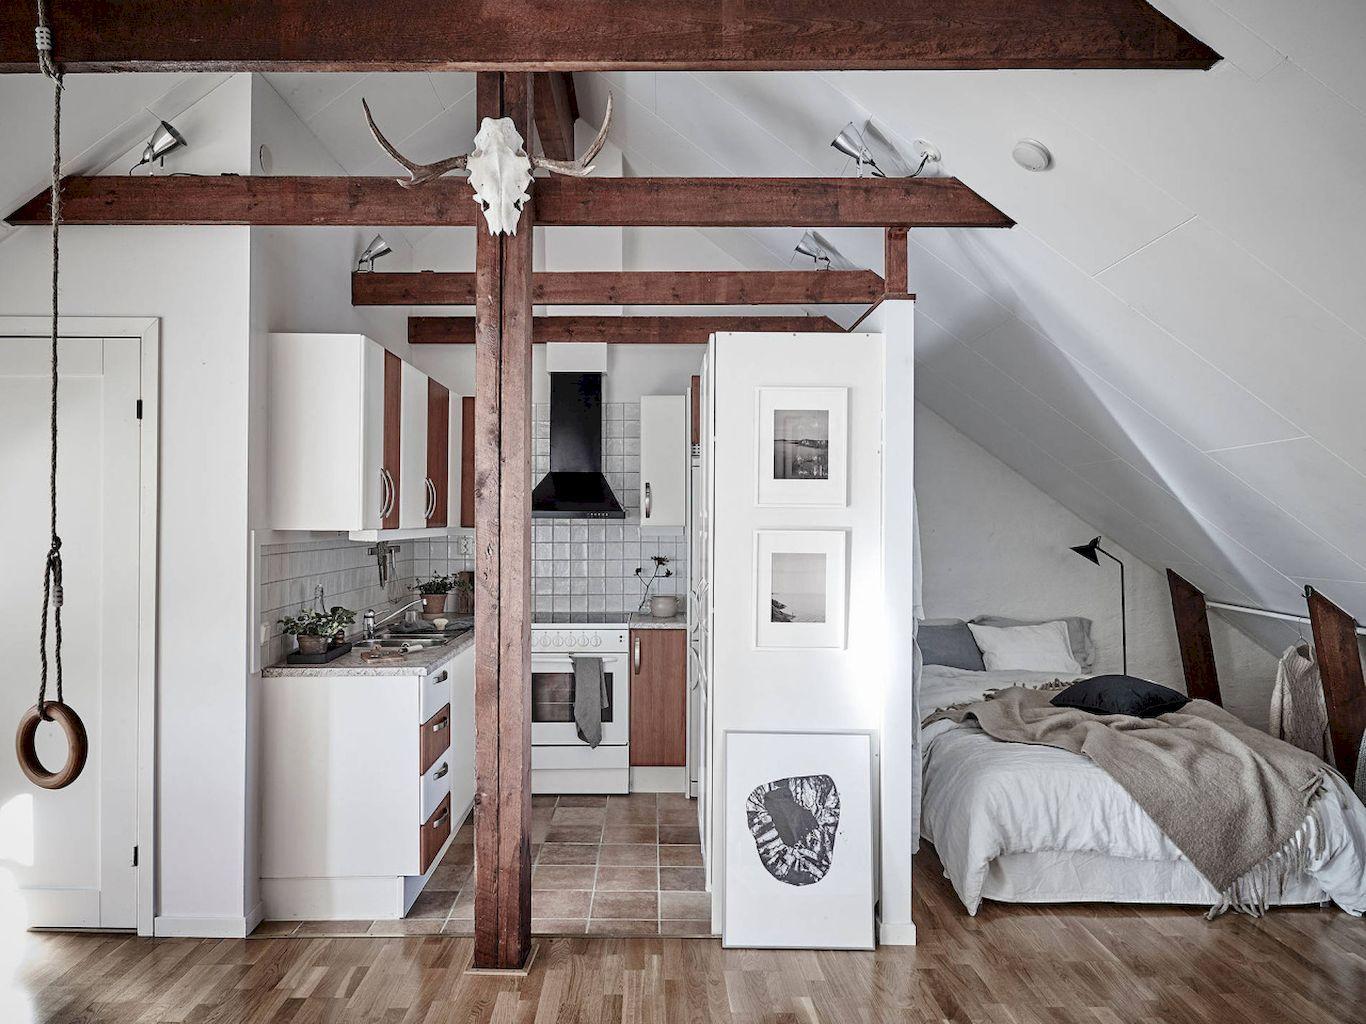 70 Cozy Attic Apartment Design & Decor Inspirations | Inneneinrichtung